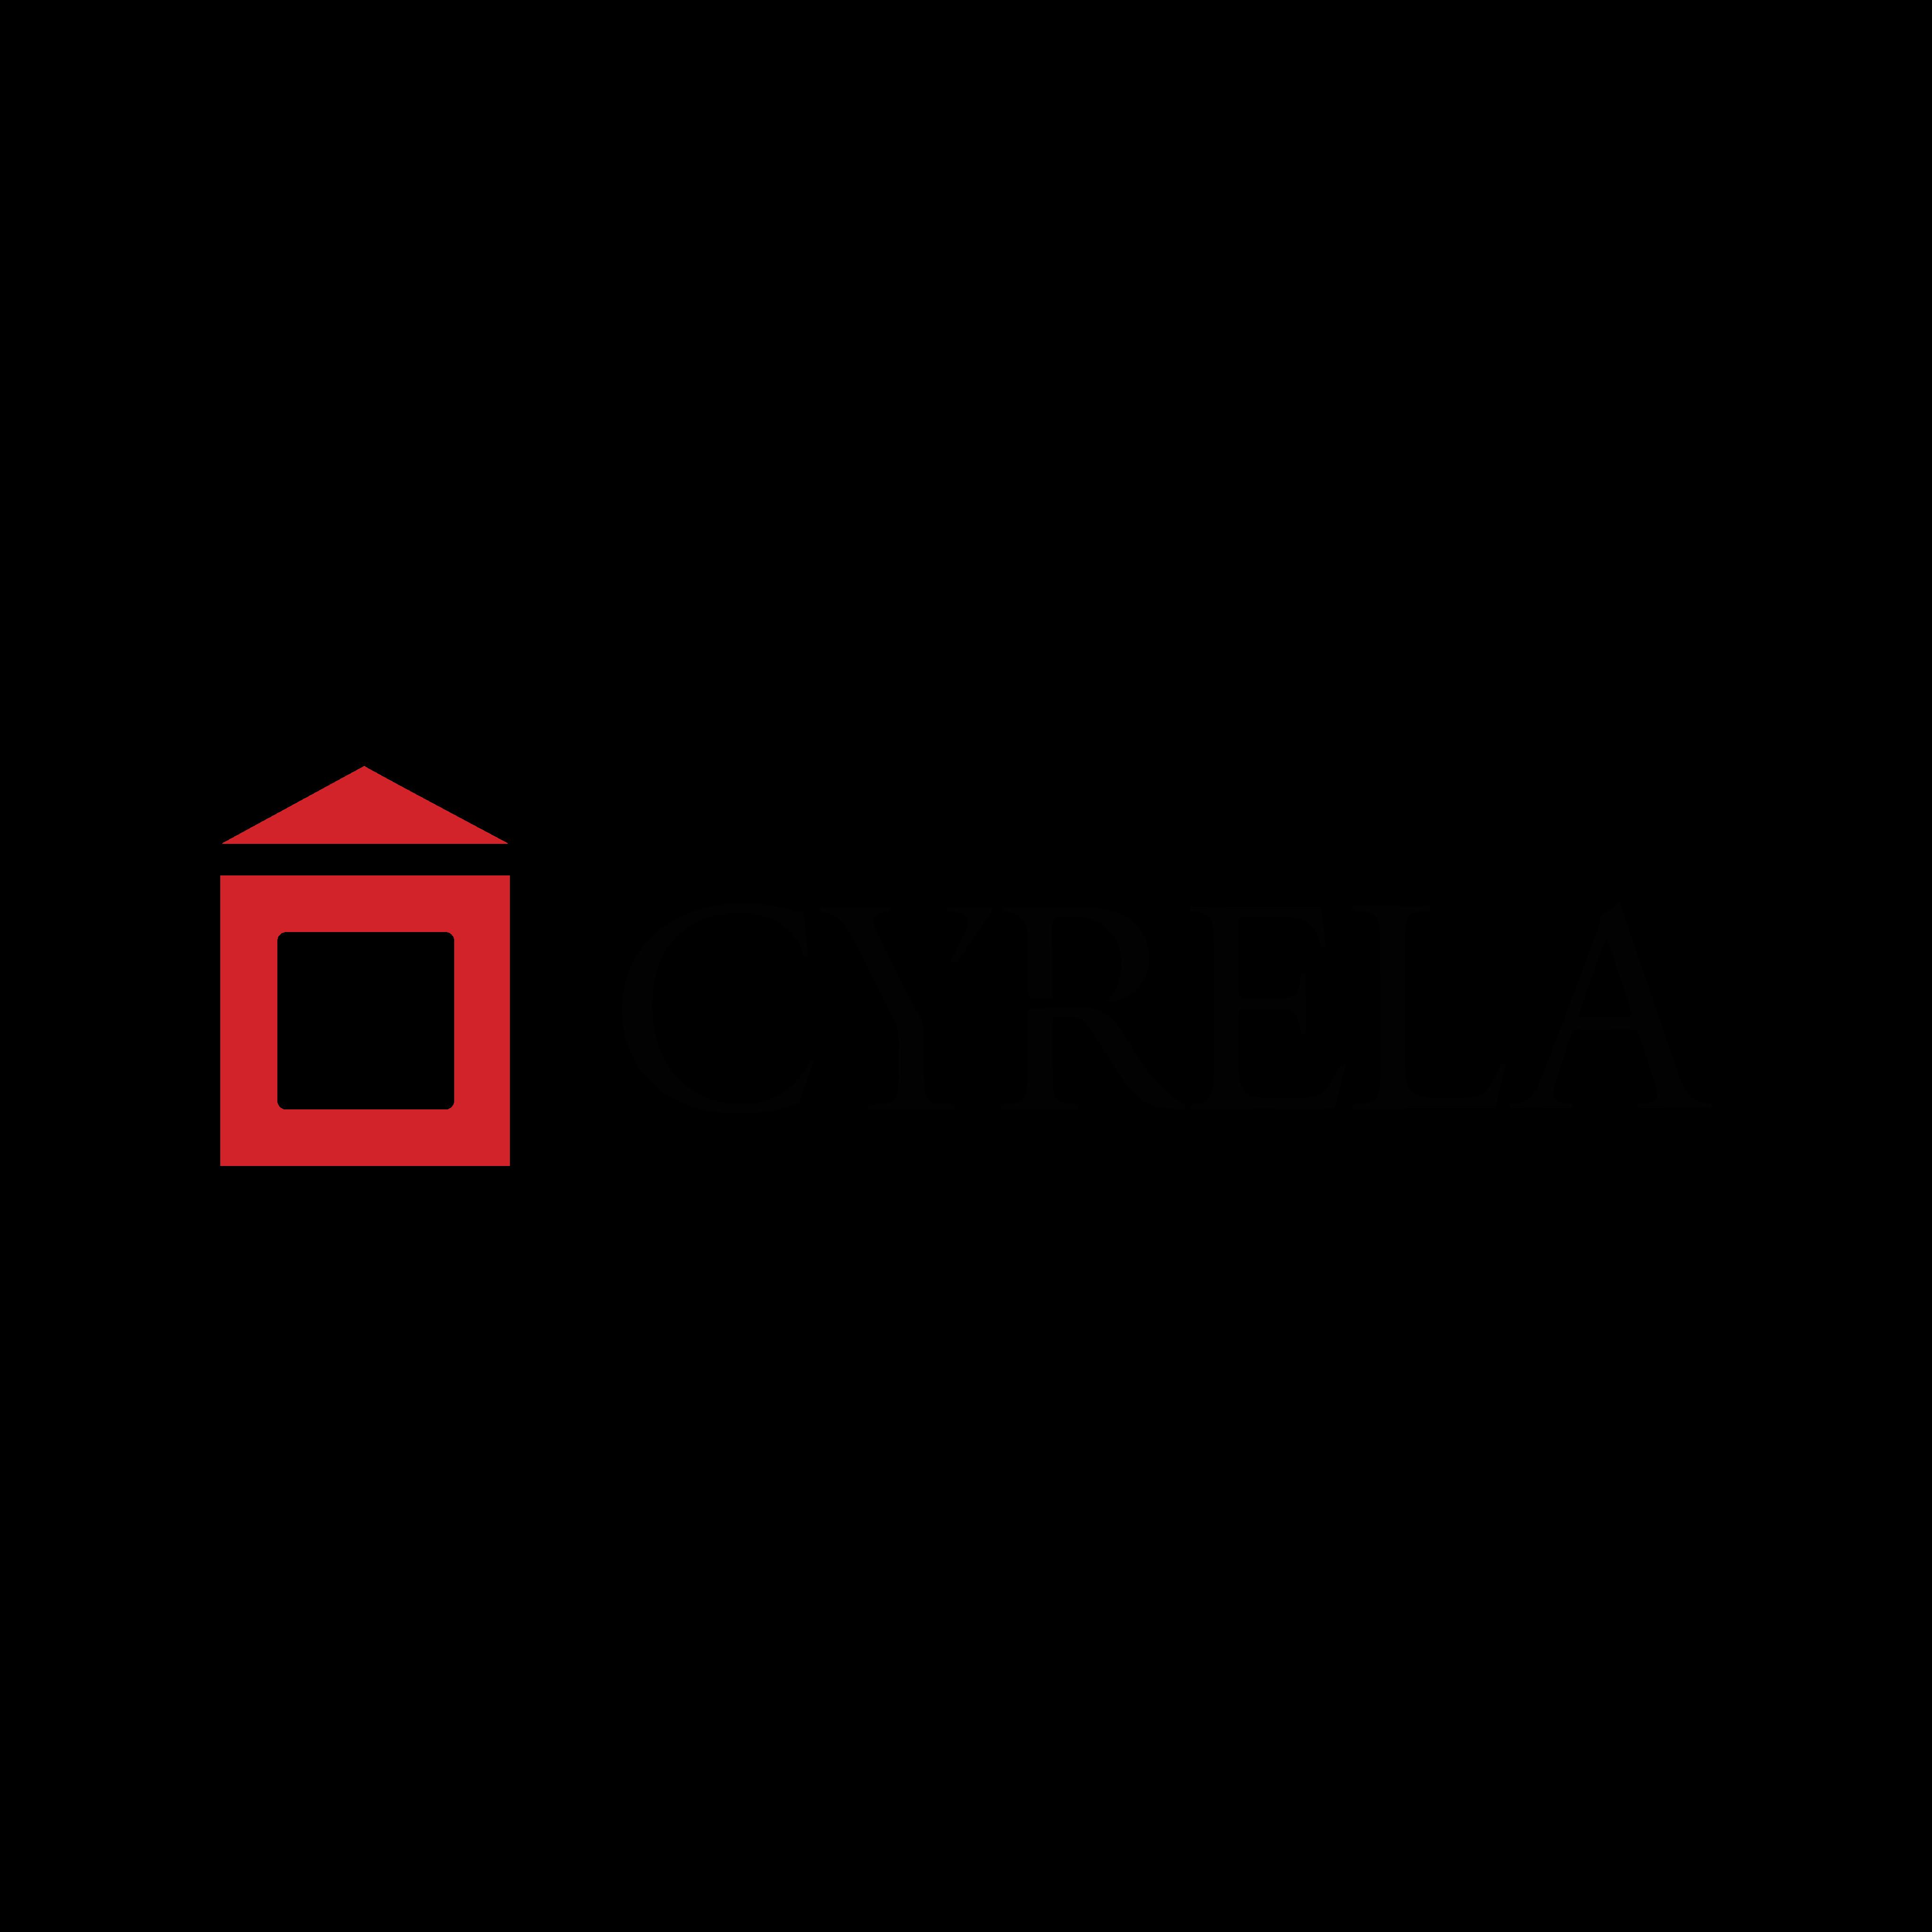 cyrela logo 0 - Cyrela Logo